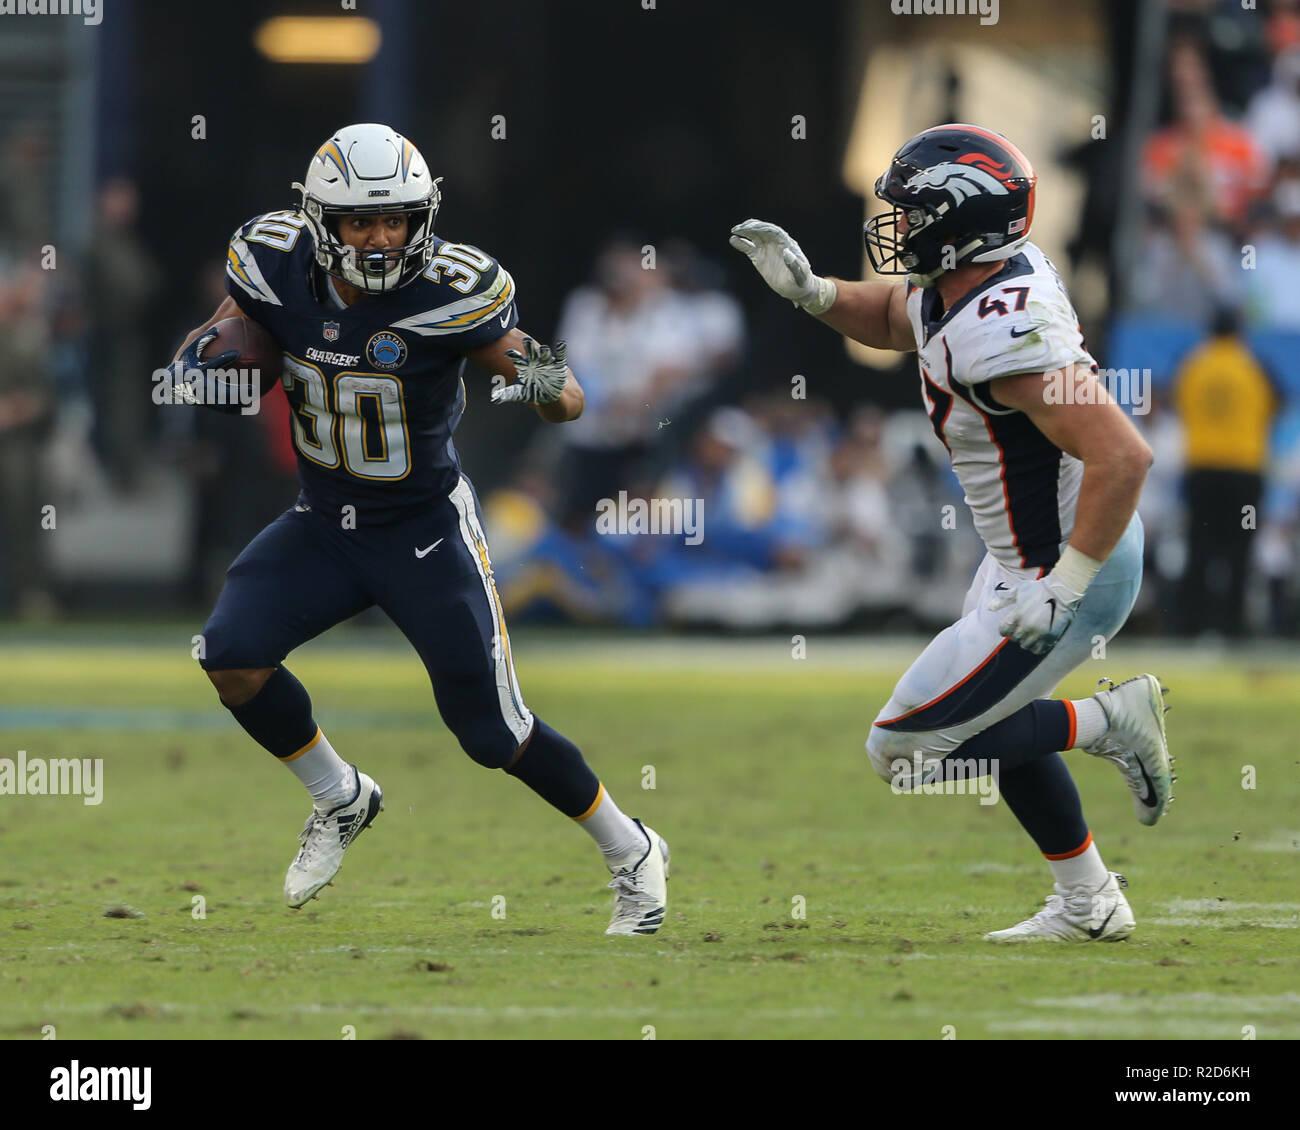 217b7691 Carson, CA. 18th Nov, 2018. Los Angeles Chargers running back Austin ...